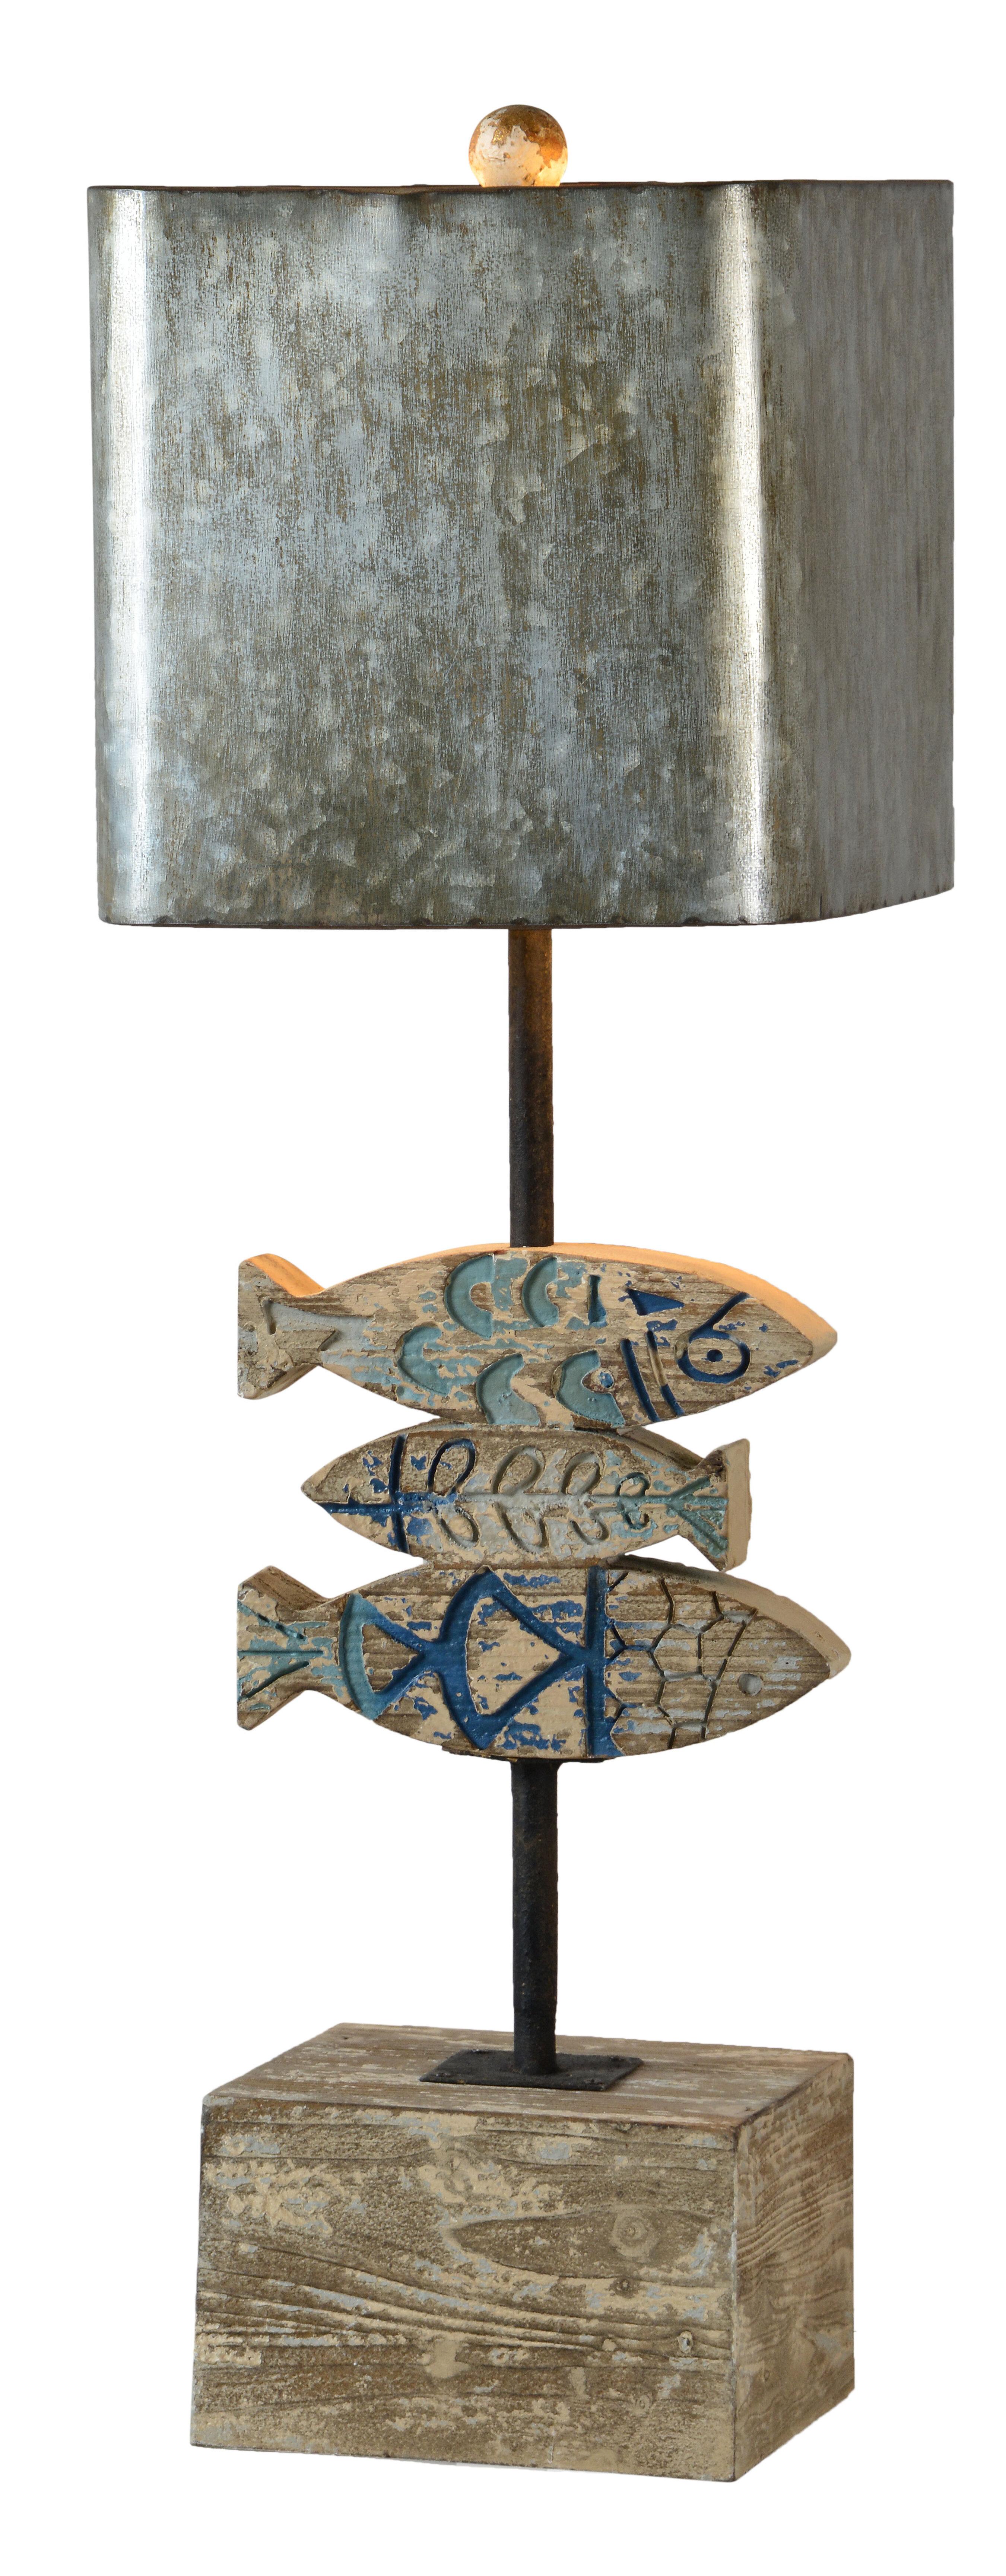 ARTSYLAMP Forest Cute Fox Wood Base Decoration Desk Table Bedside Light Lamp